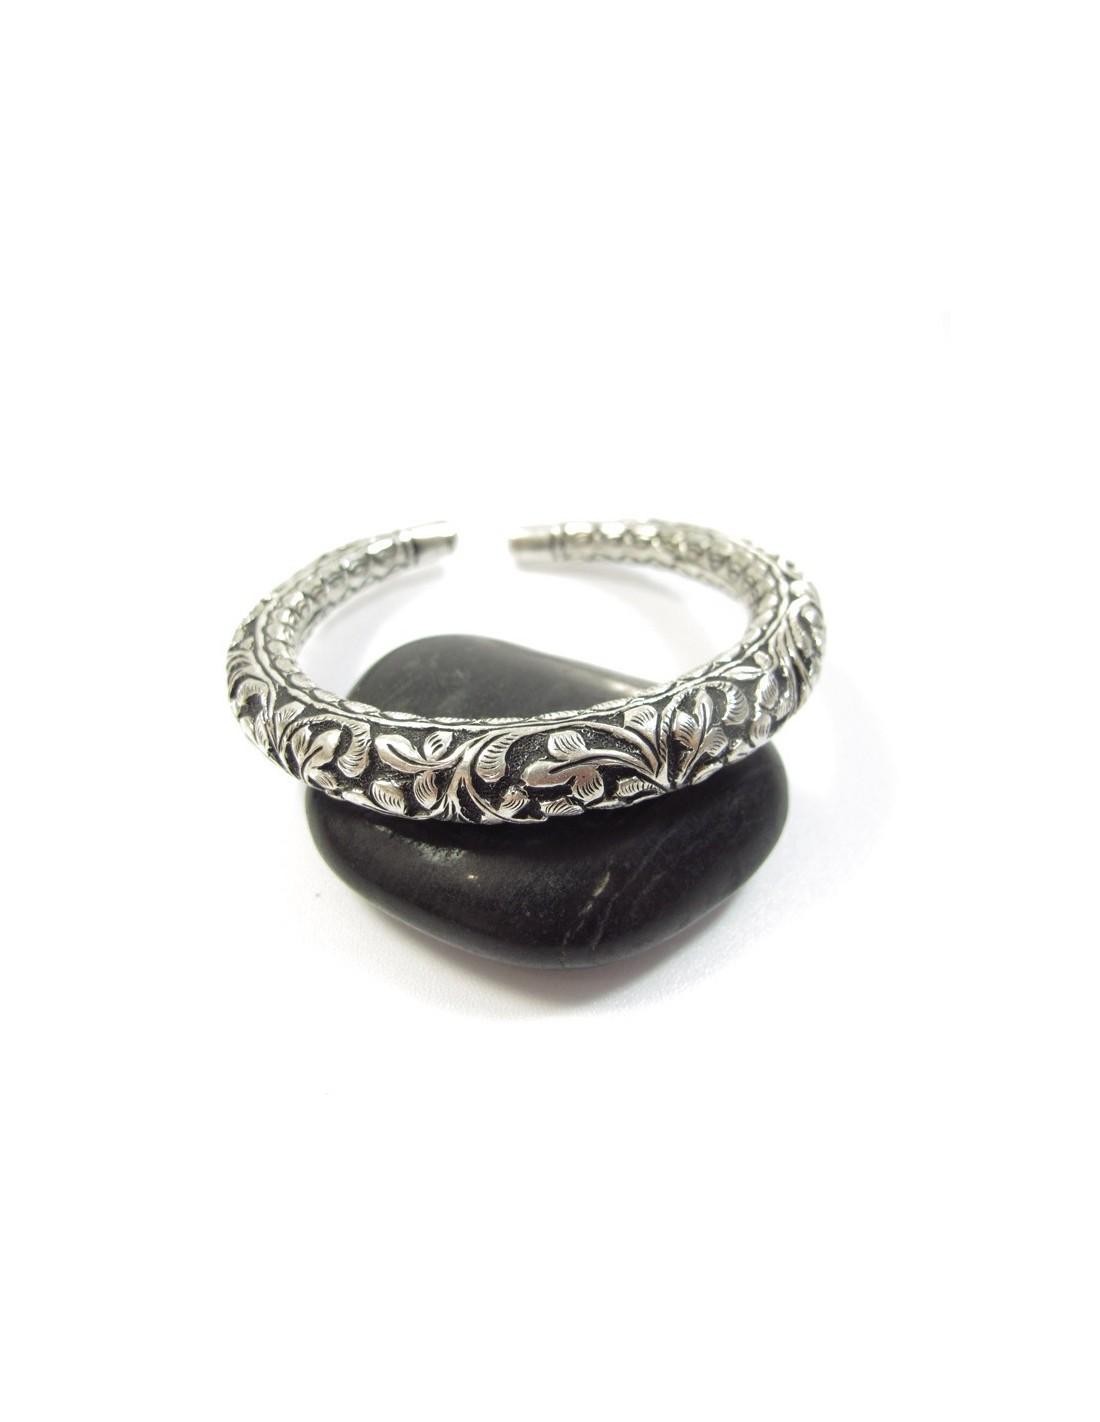 bracelet argent jonc cisel bijoux argent de pushkar. Black Bedroom Furniture Sets. Home Design Ideas